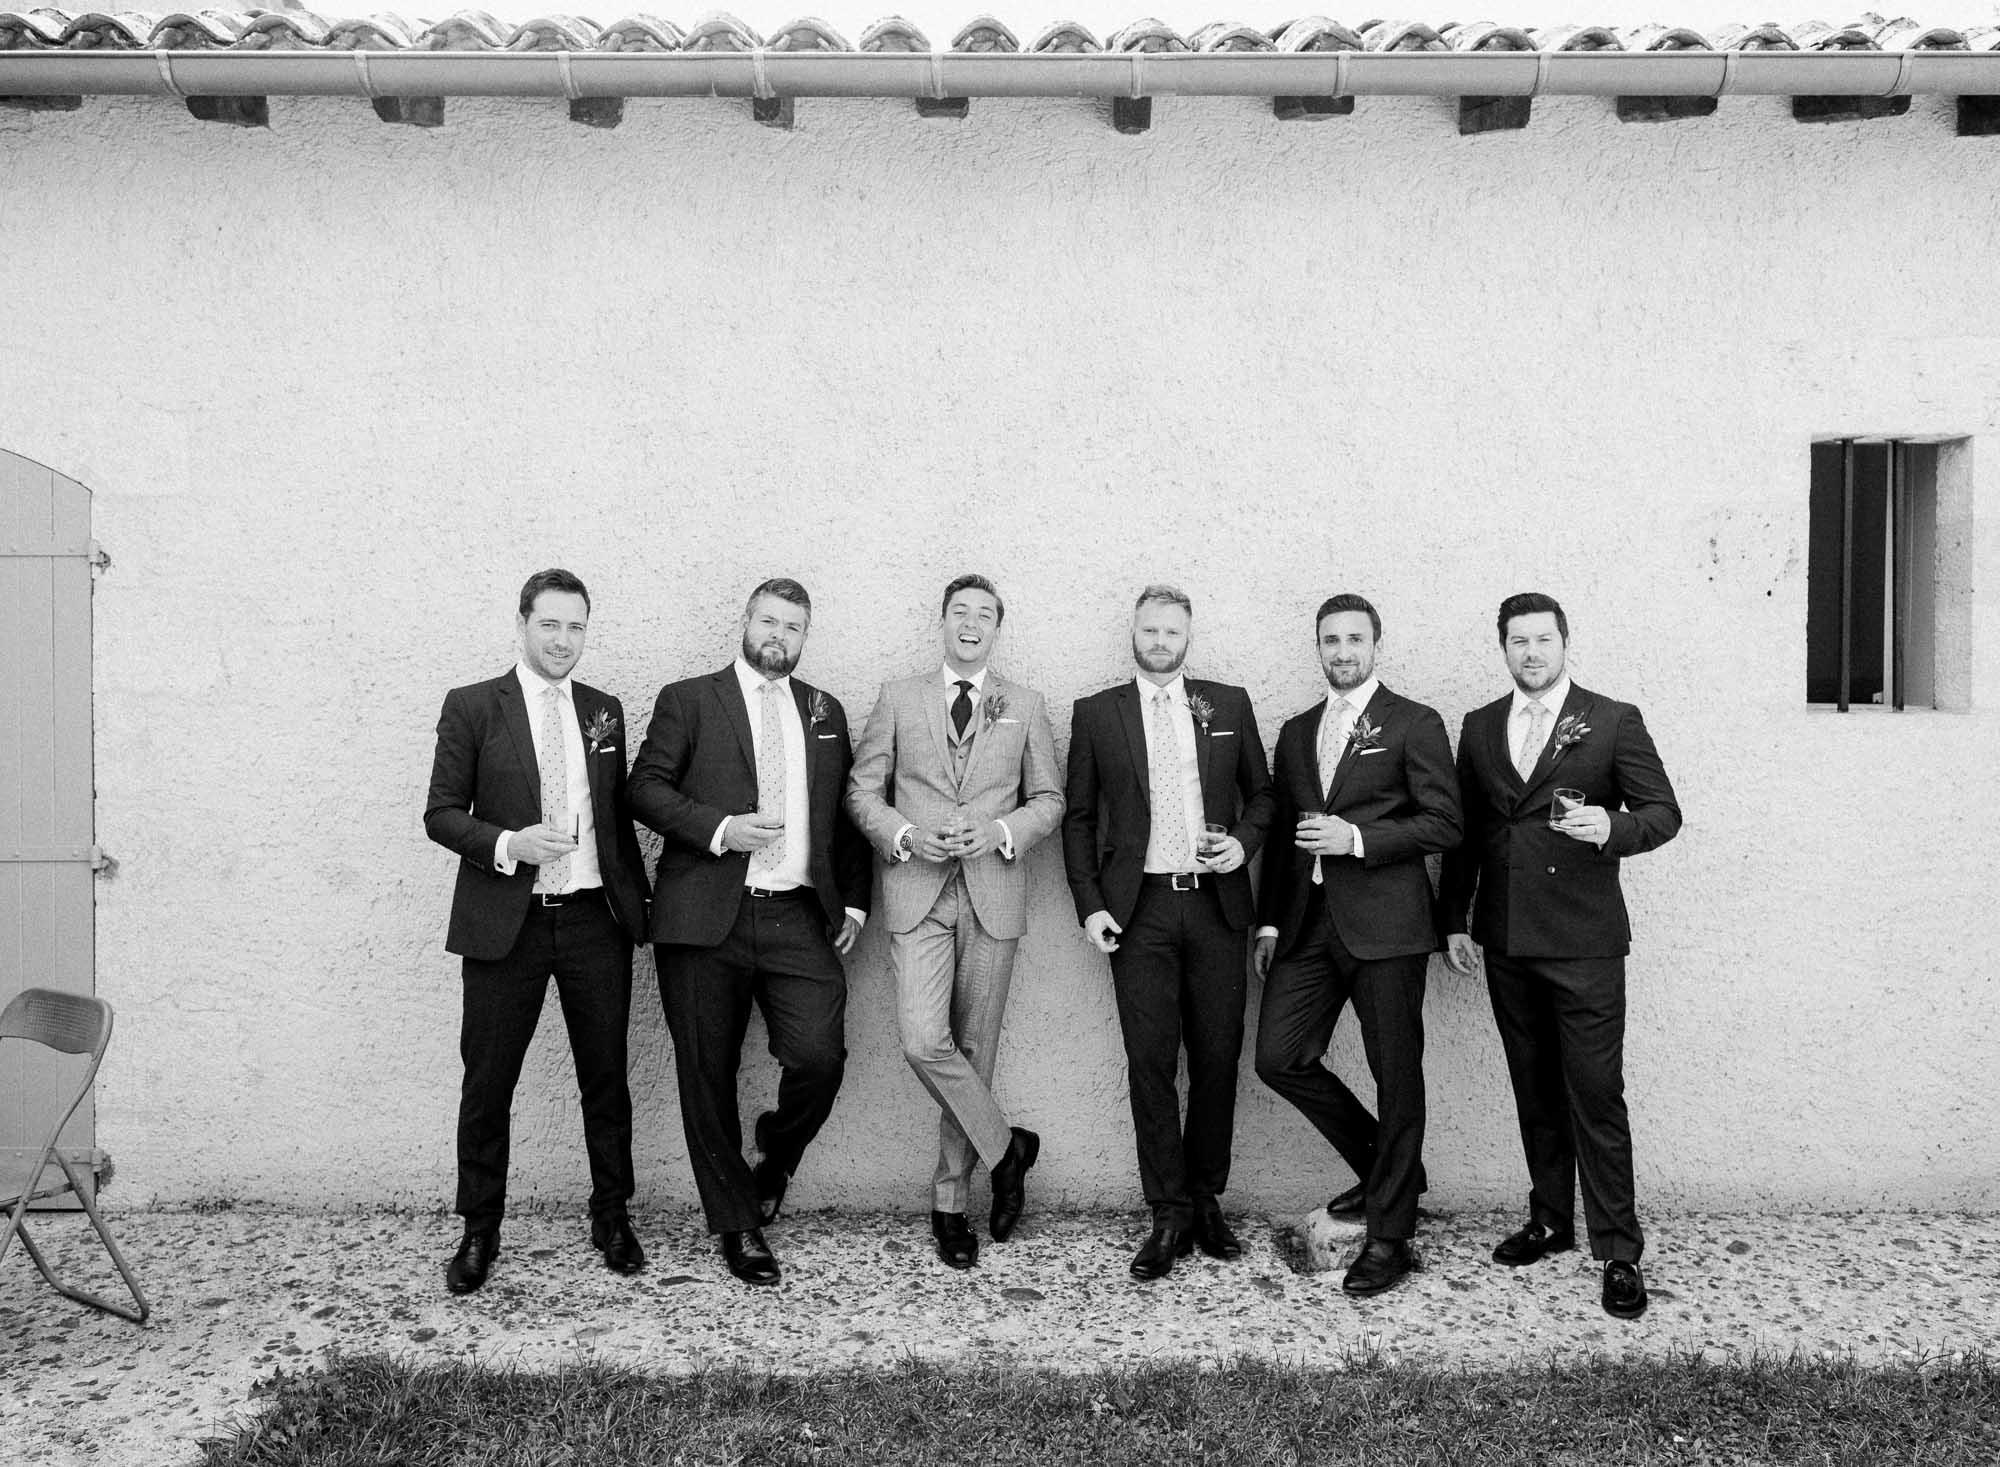 gascony_french_wedding-22.jpg